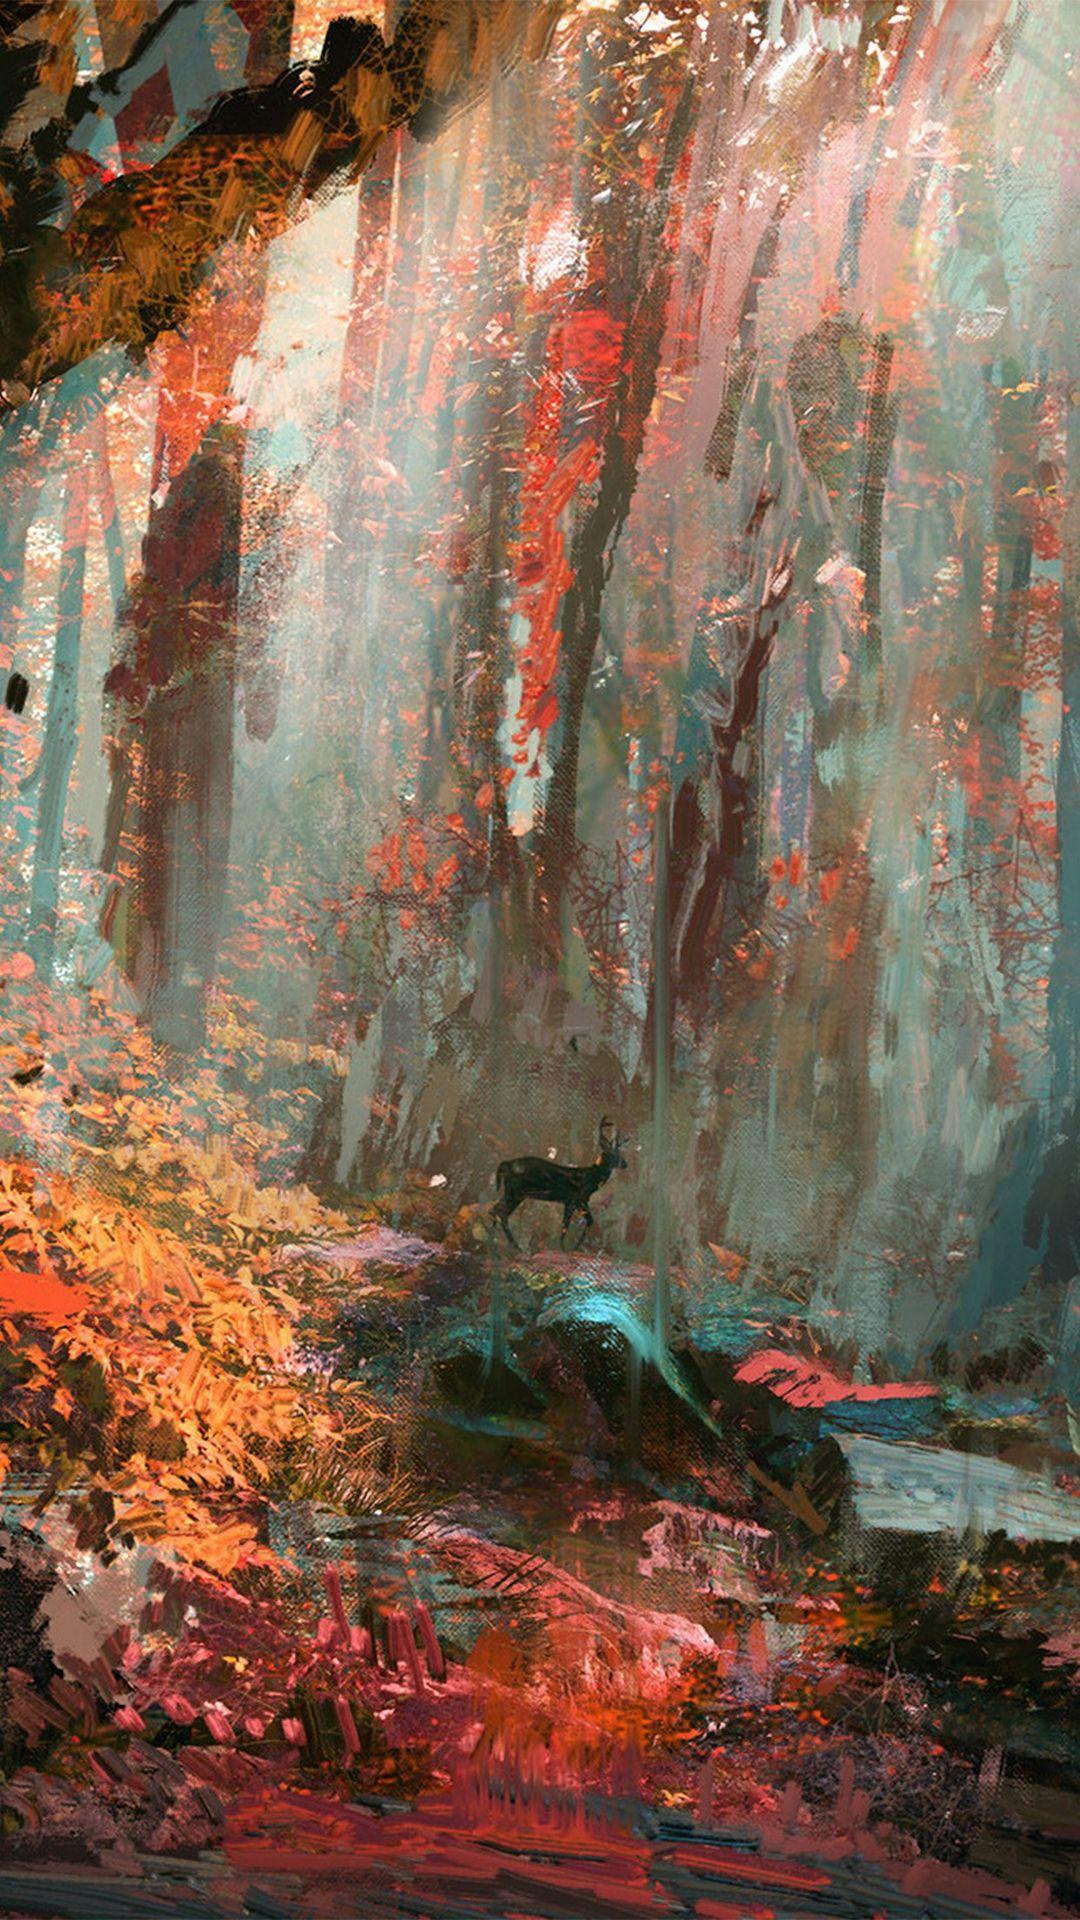 Rain Deer Forest Illustration Art IPhone 6 Wallpaper